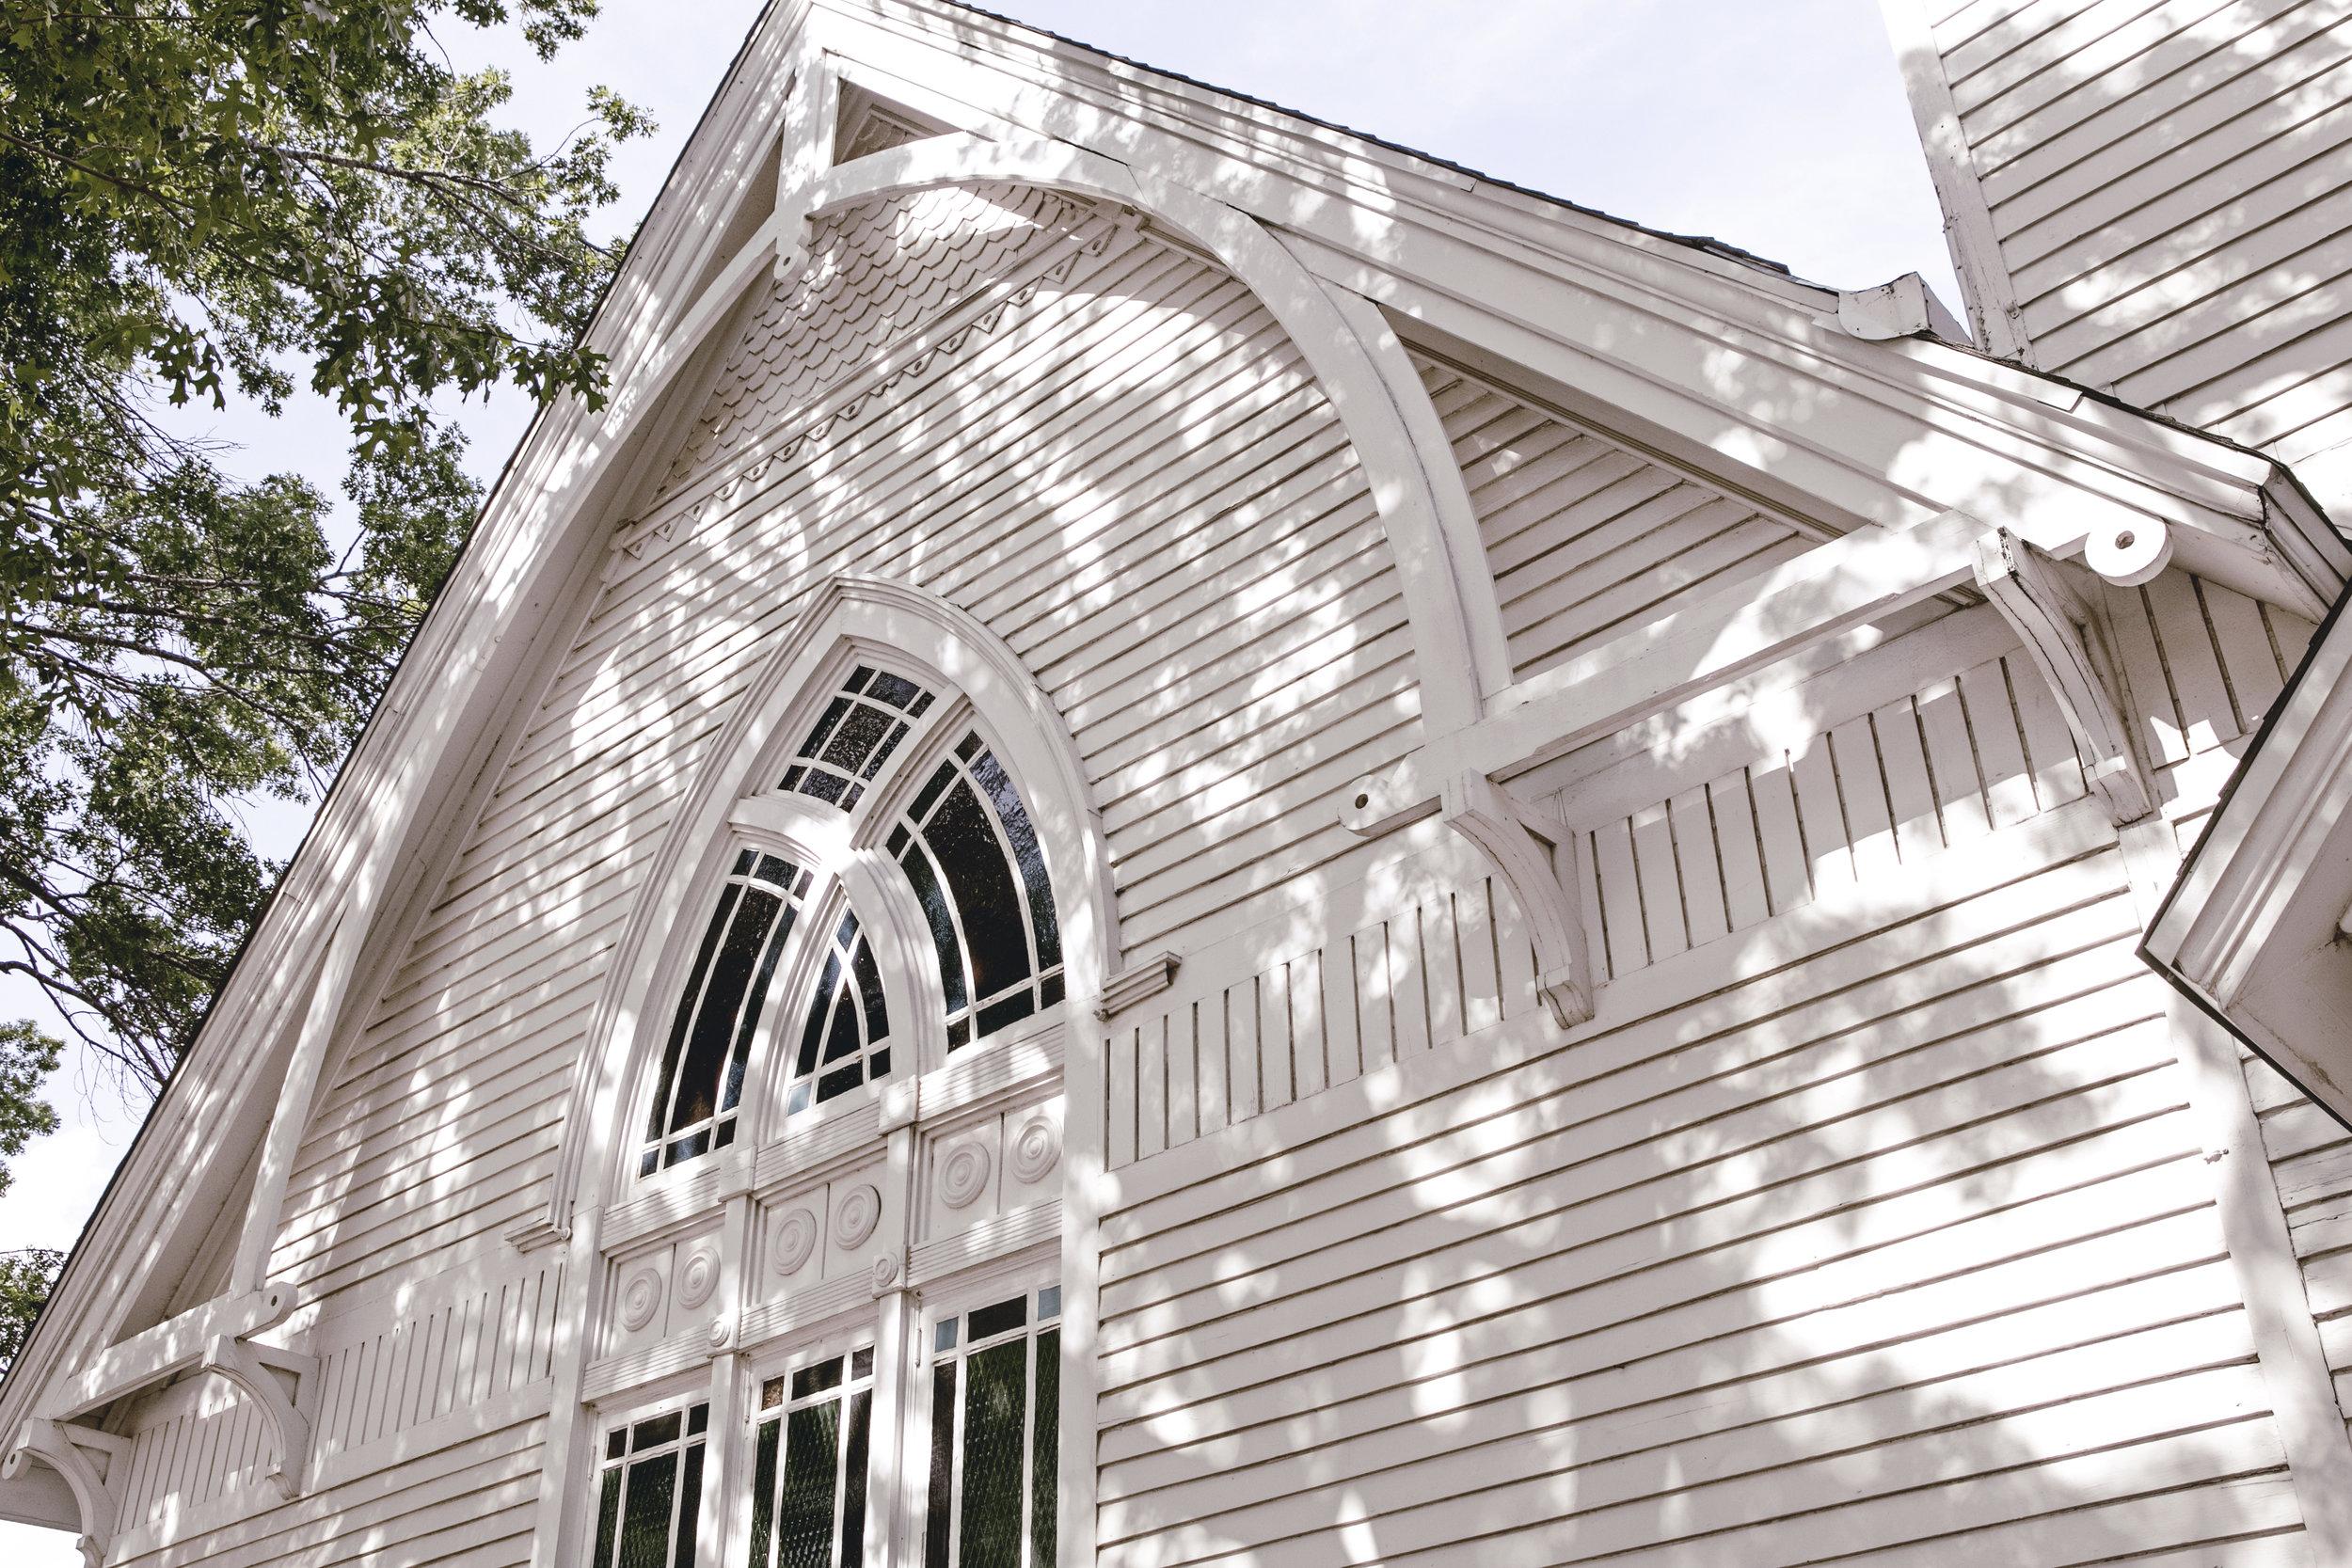 Lorena texas church / heirloomed travel